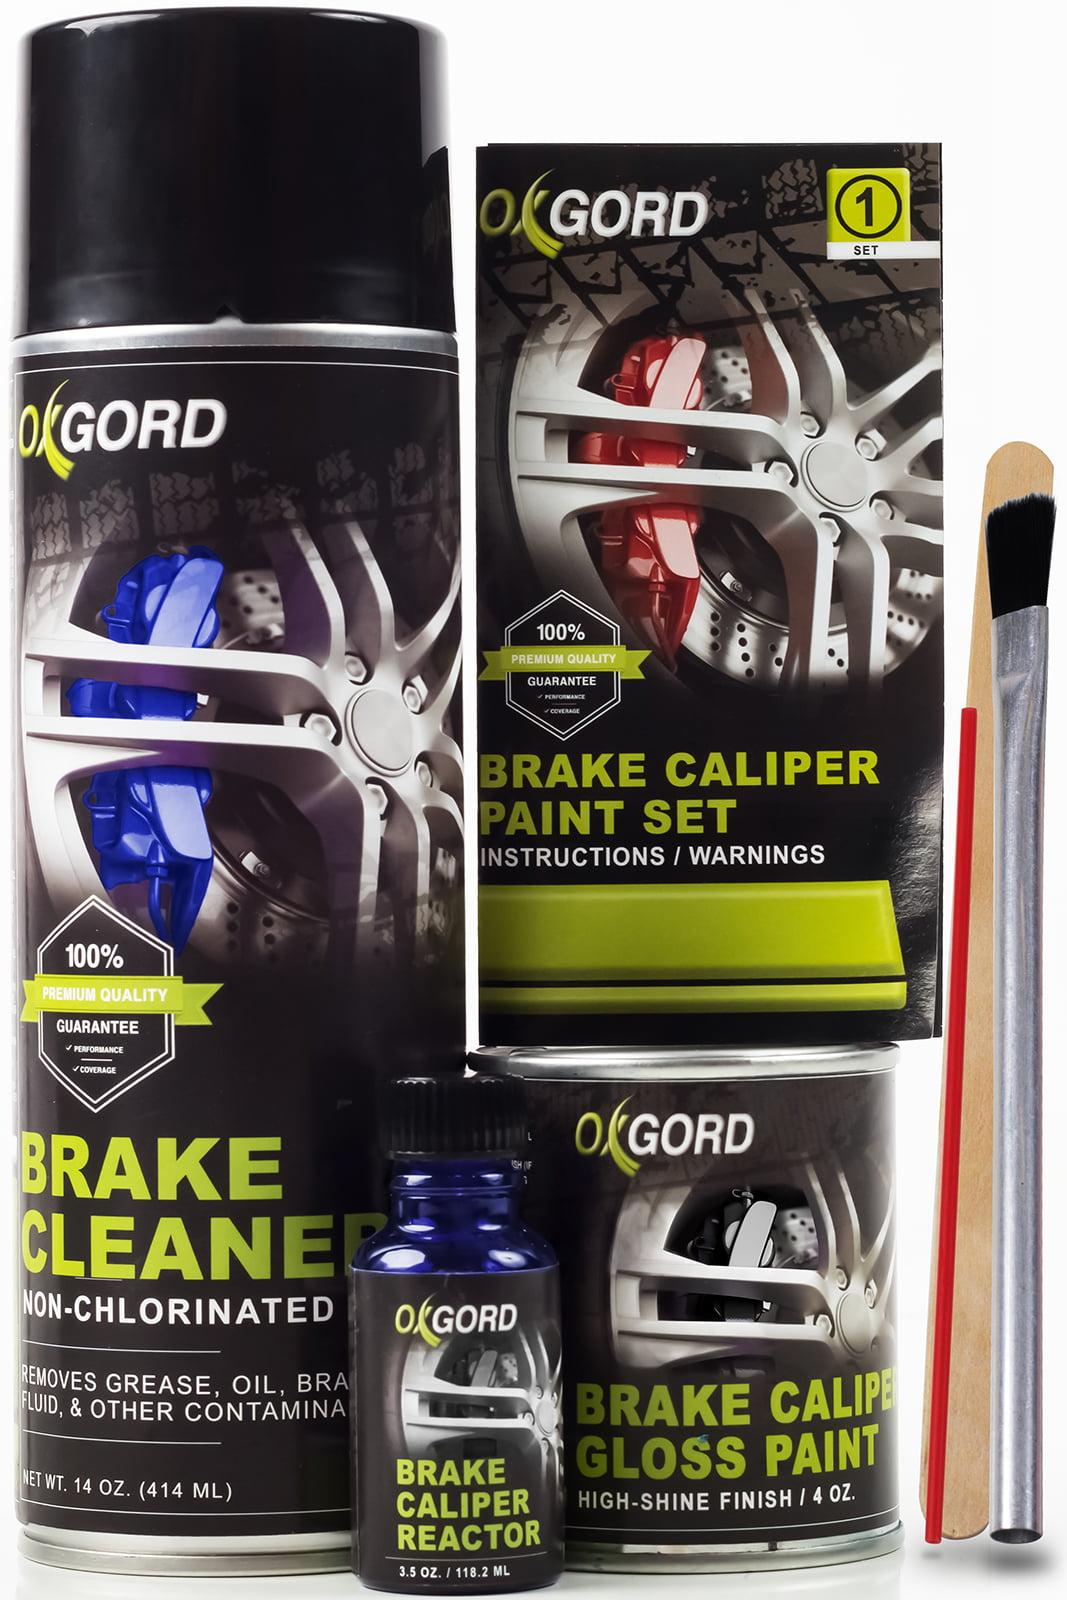 Black Paint For Brake Calipers Rotors Engine High Heat 2 Part Epoxy Brush On Kit By Oxgord Walmart Com Walmart Com